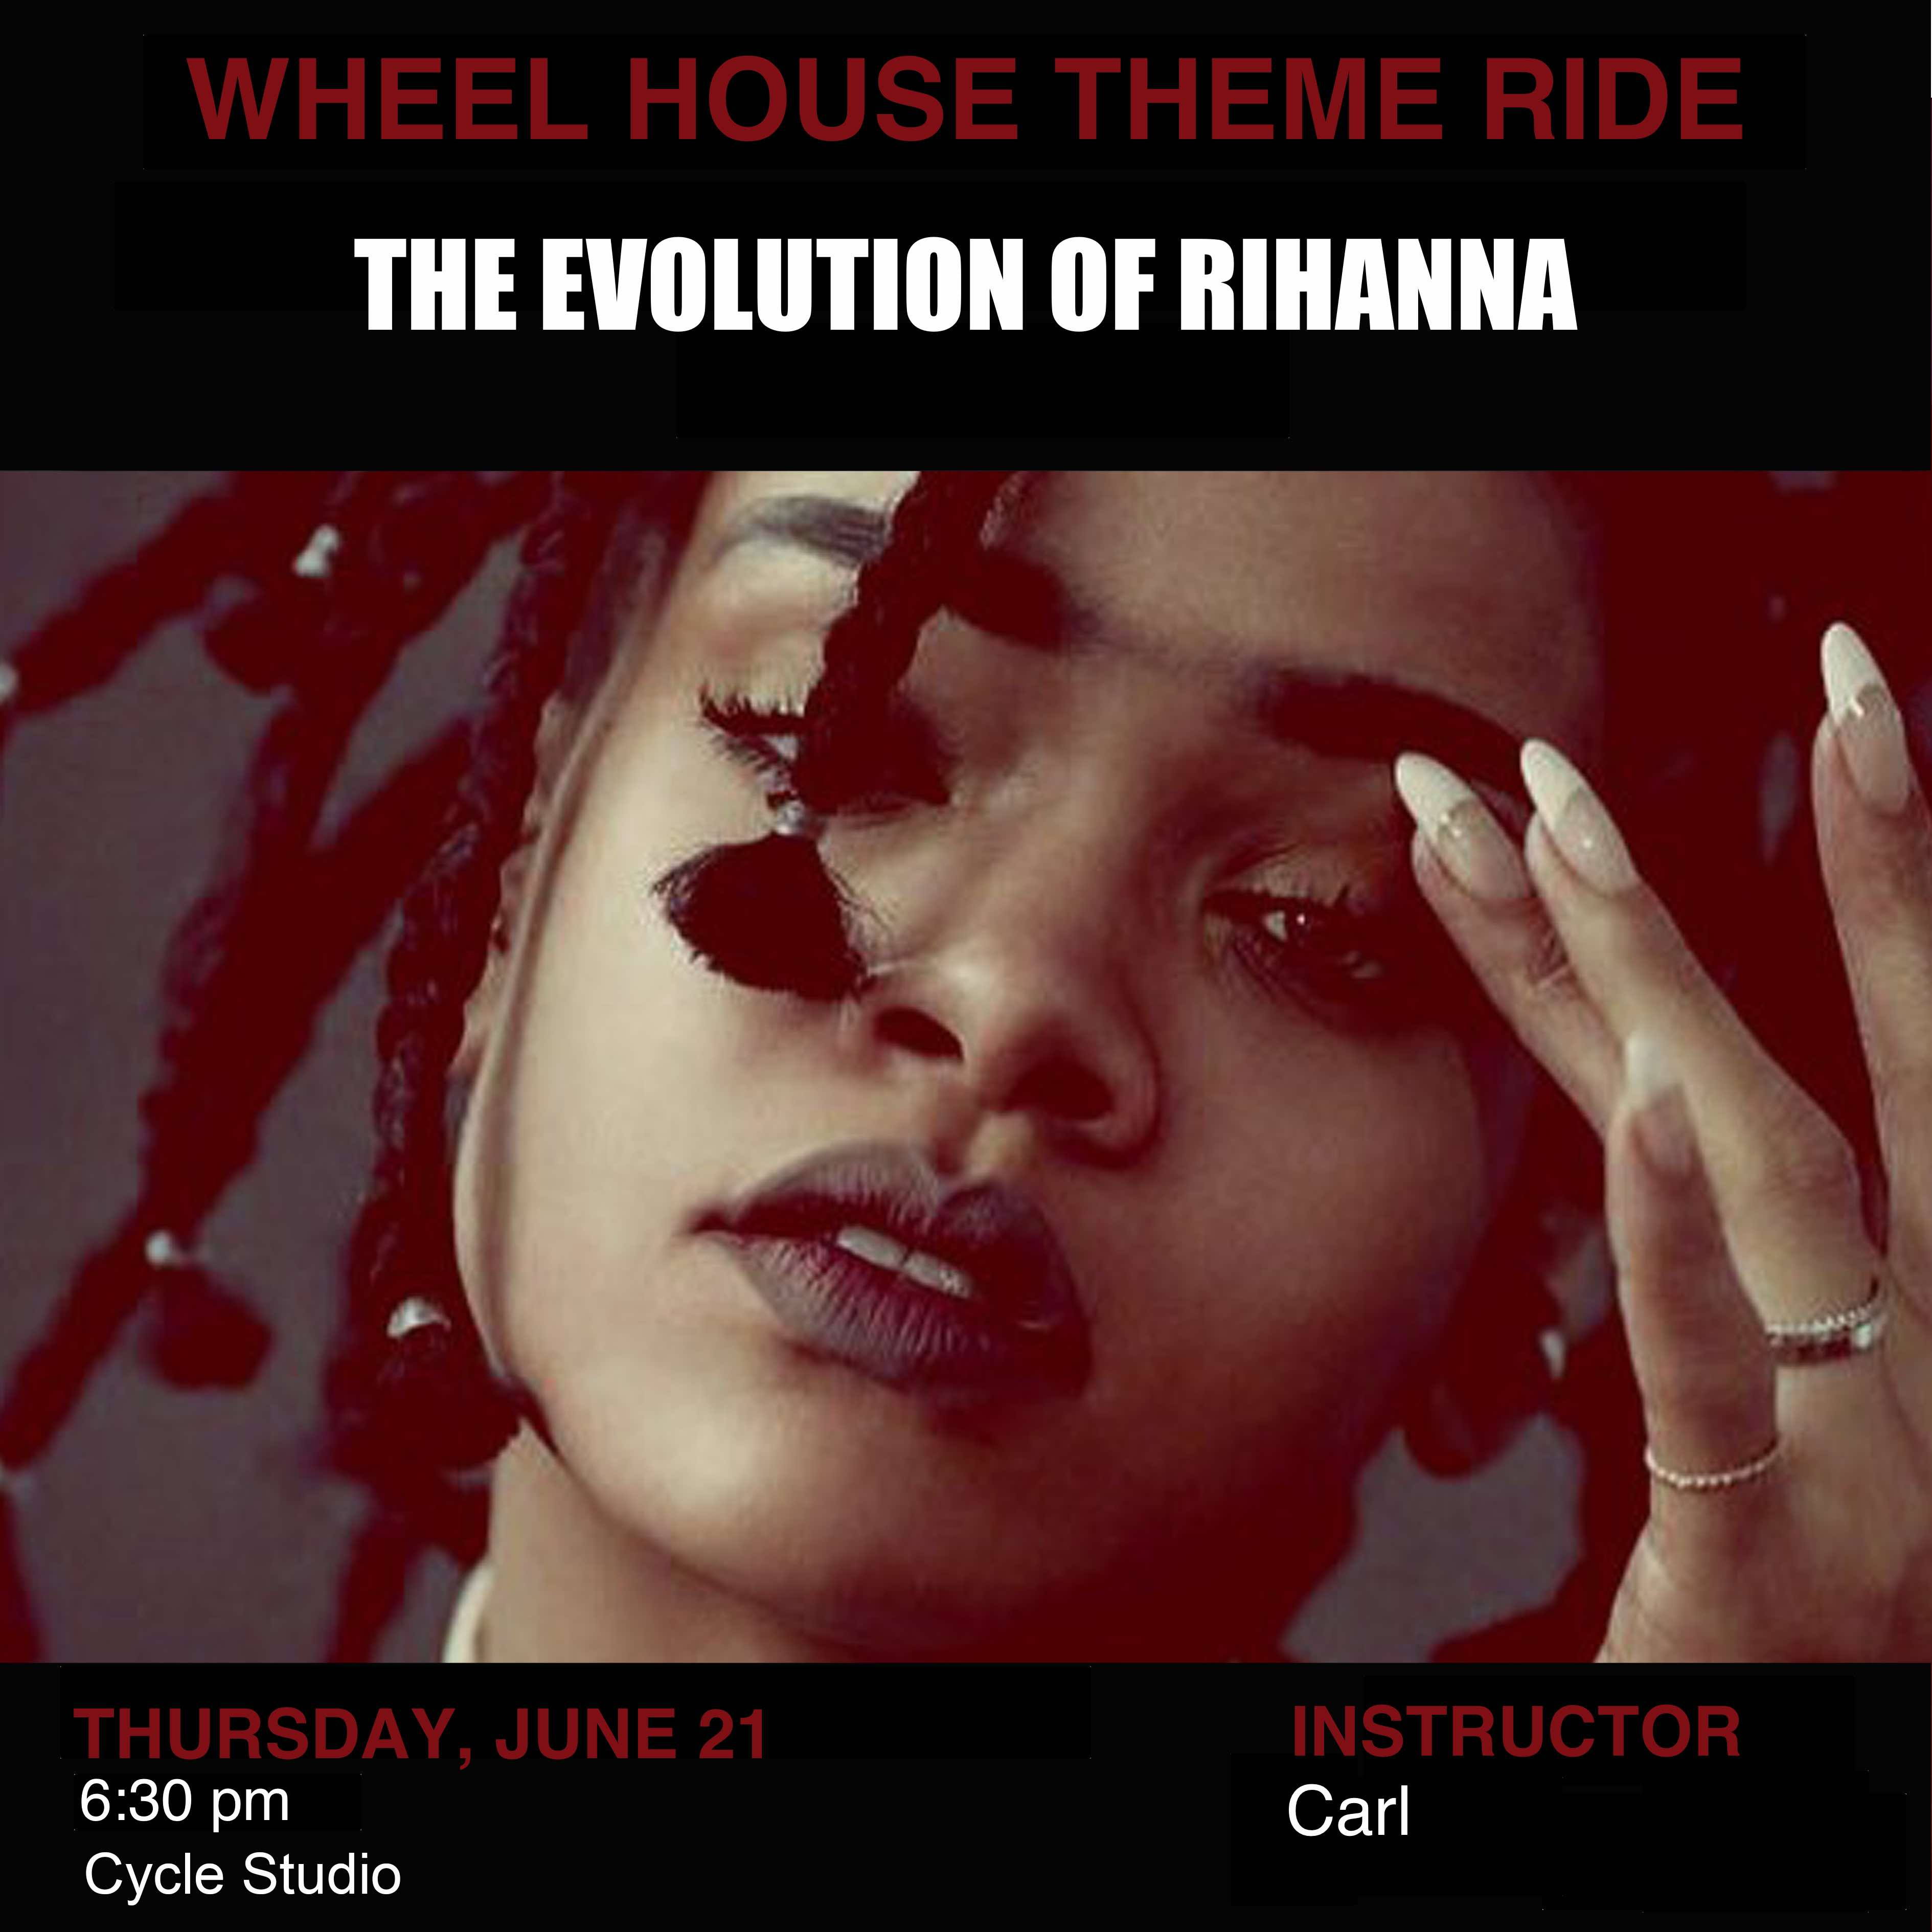 The Evolution of Rihanna